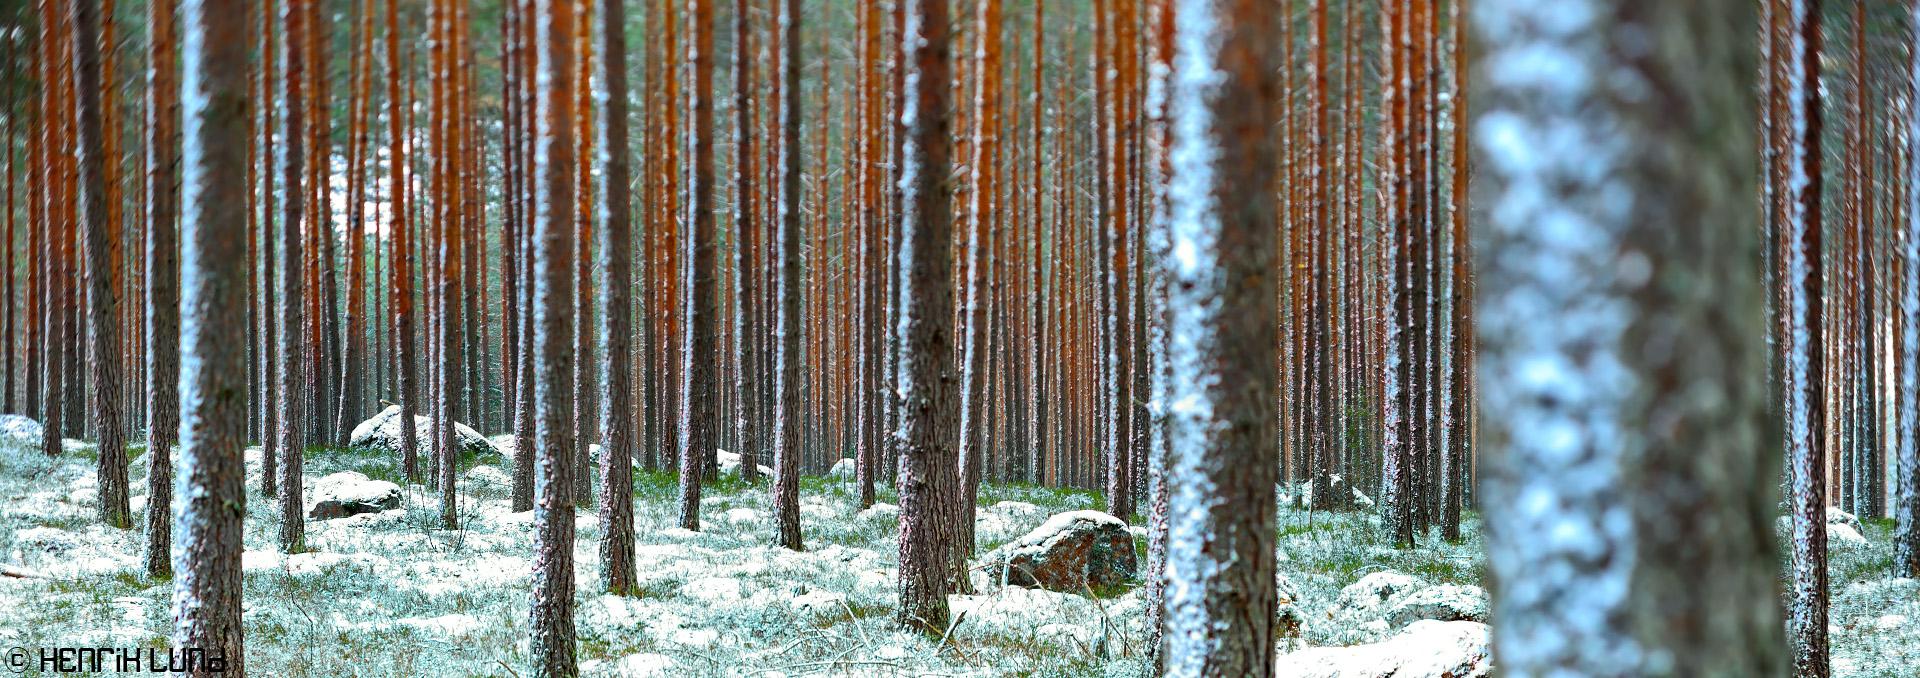 TS-E panorama at first snow of the season taken in Mysmalm, Lappträsk, Finland. November 2016.